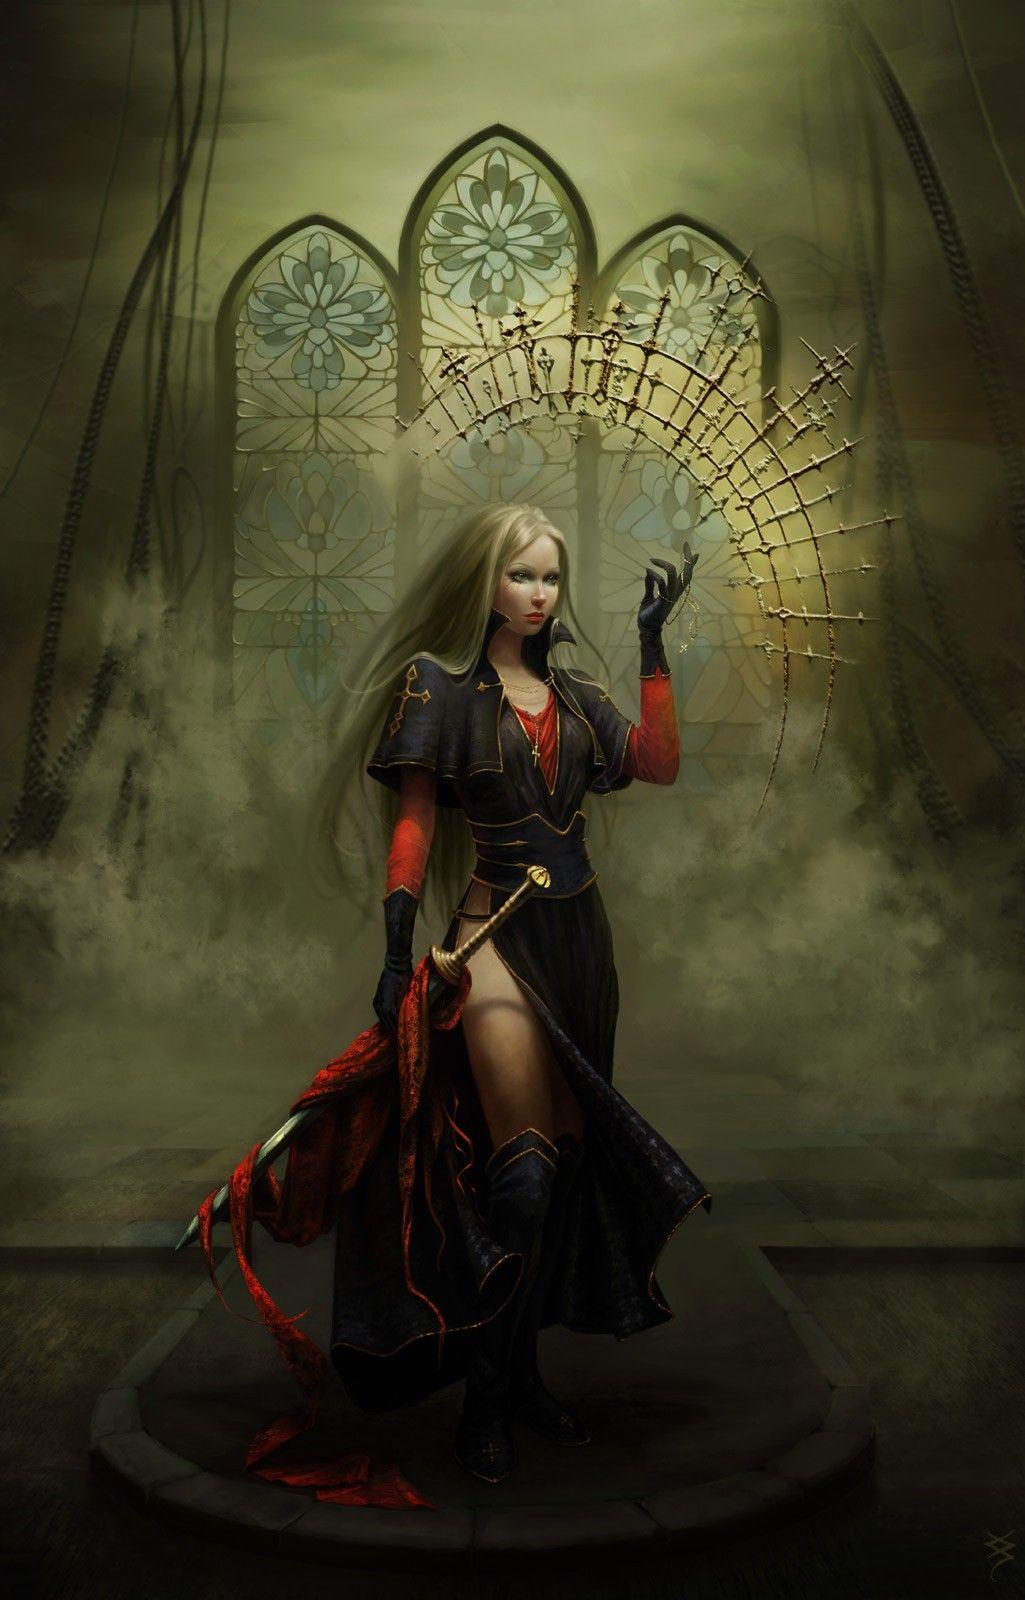 Dark Fantasy Warrior Art